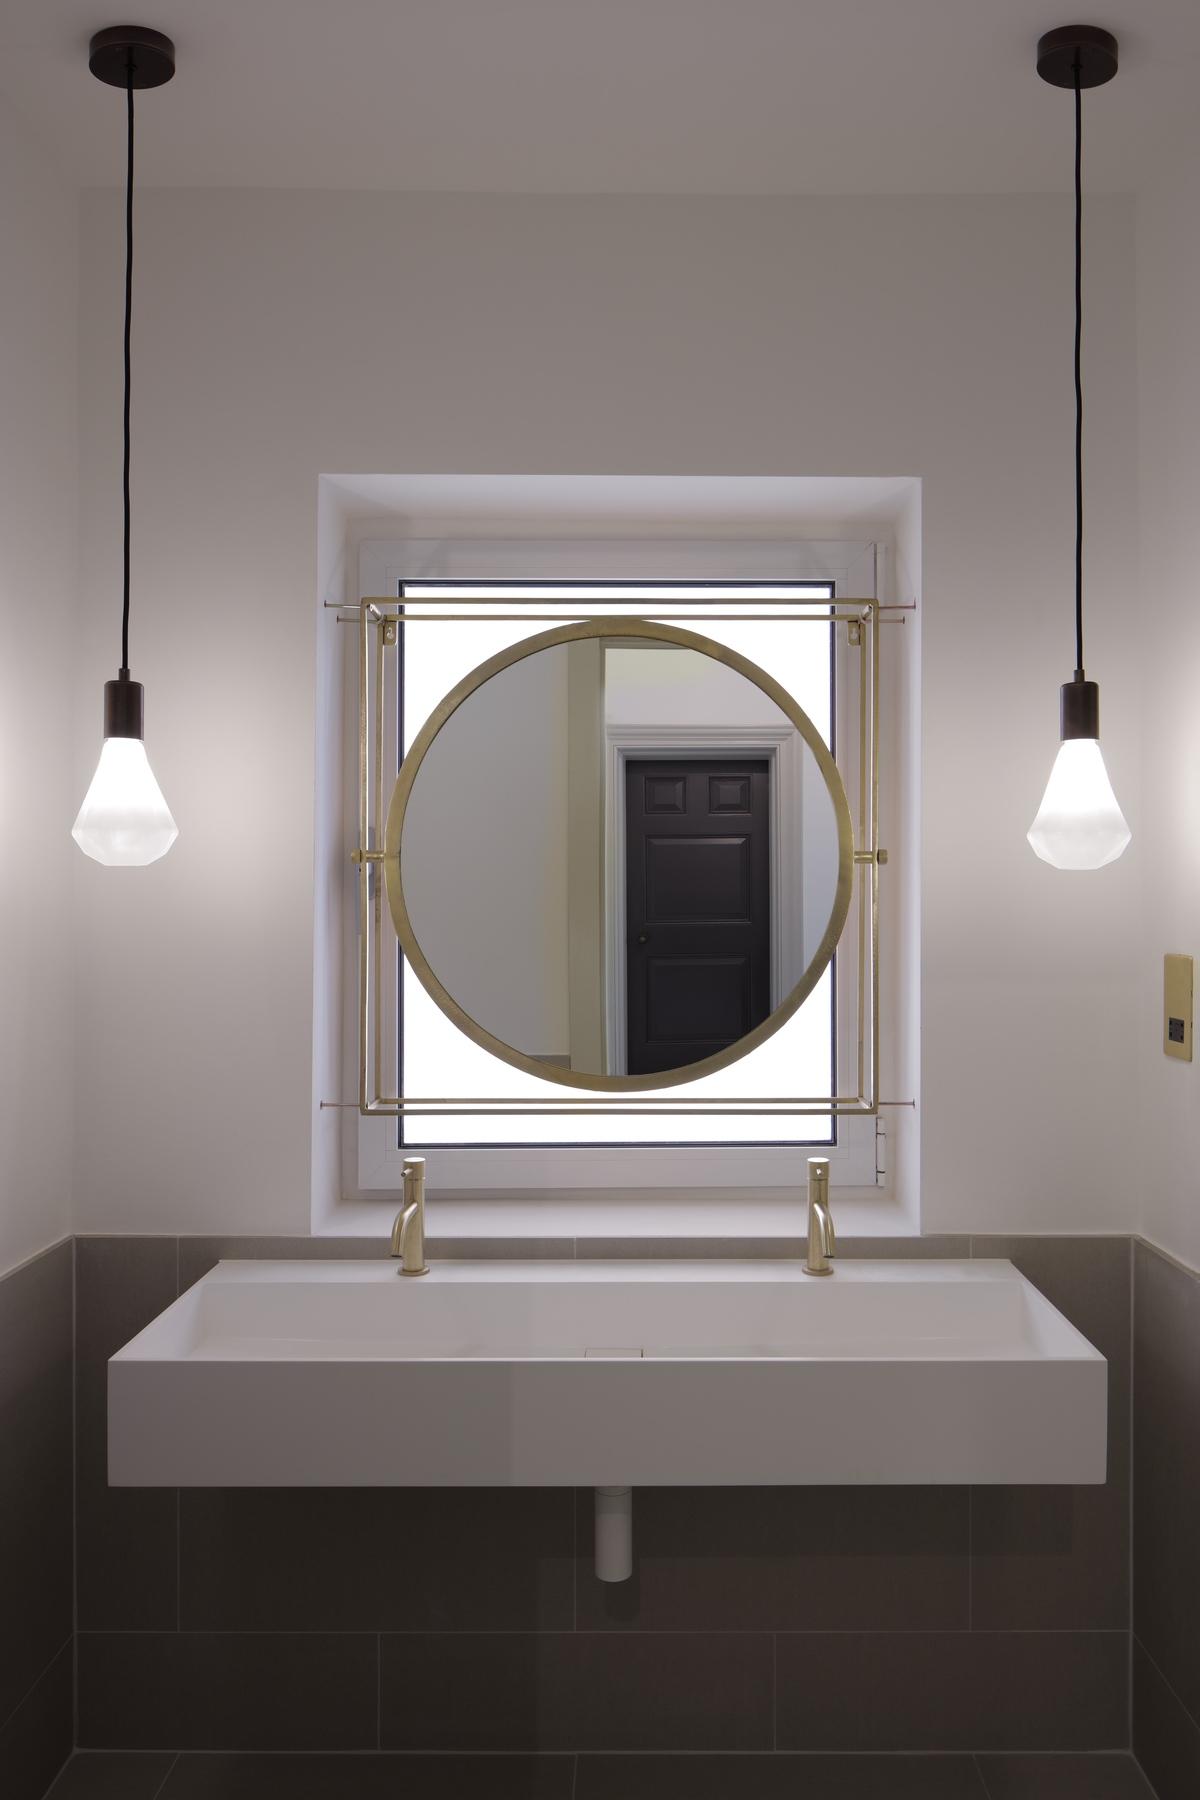 luxury mirror hanged over washing basin